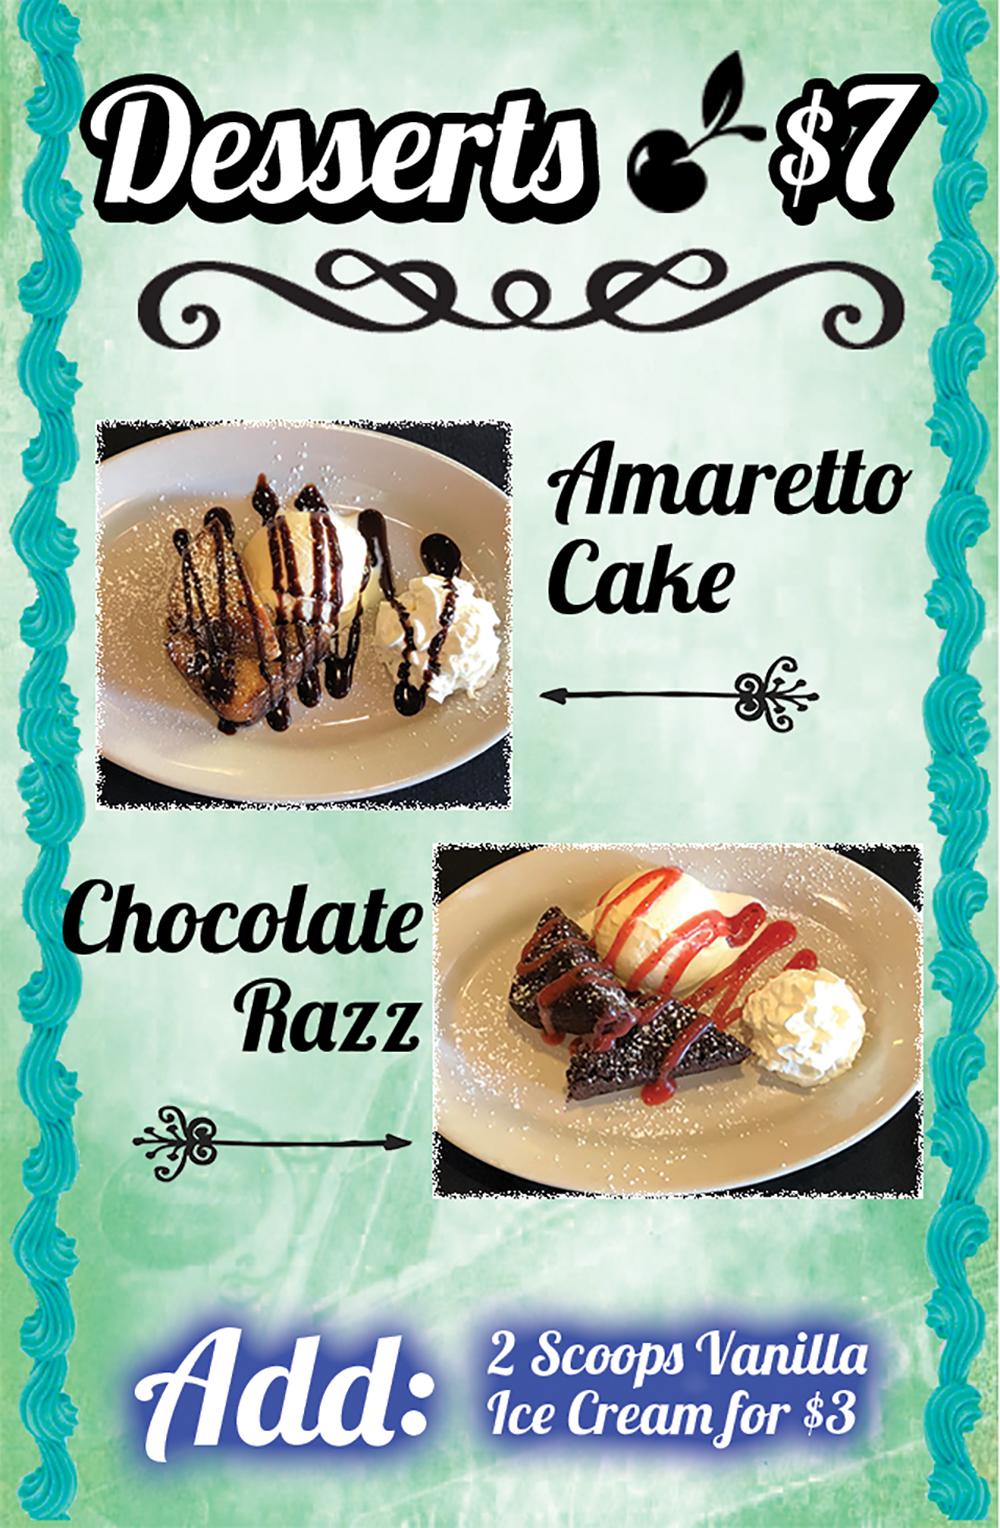 desserttent1web.jpg